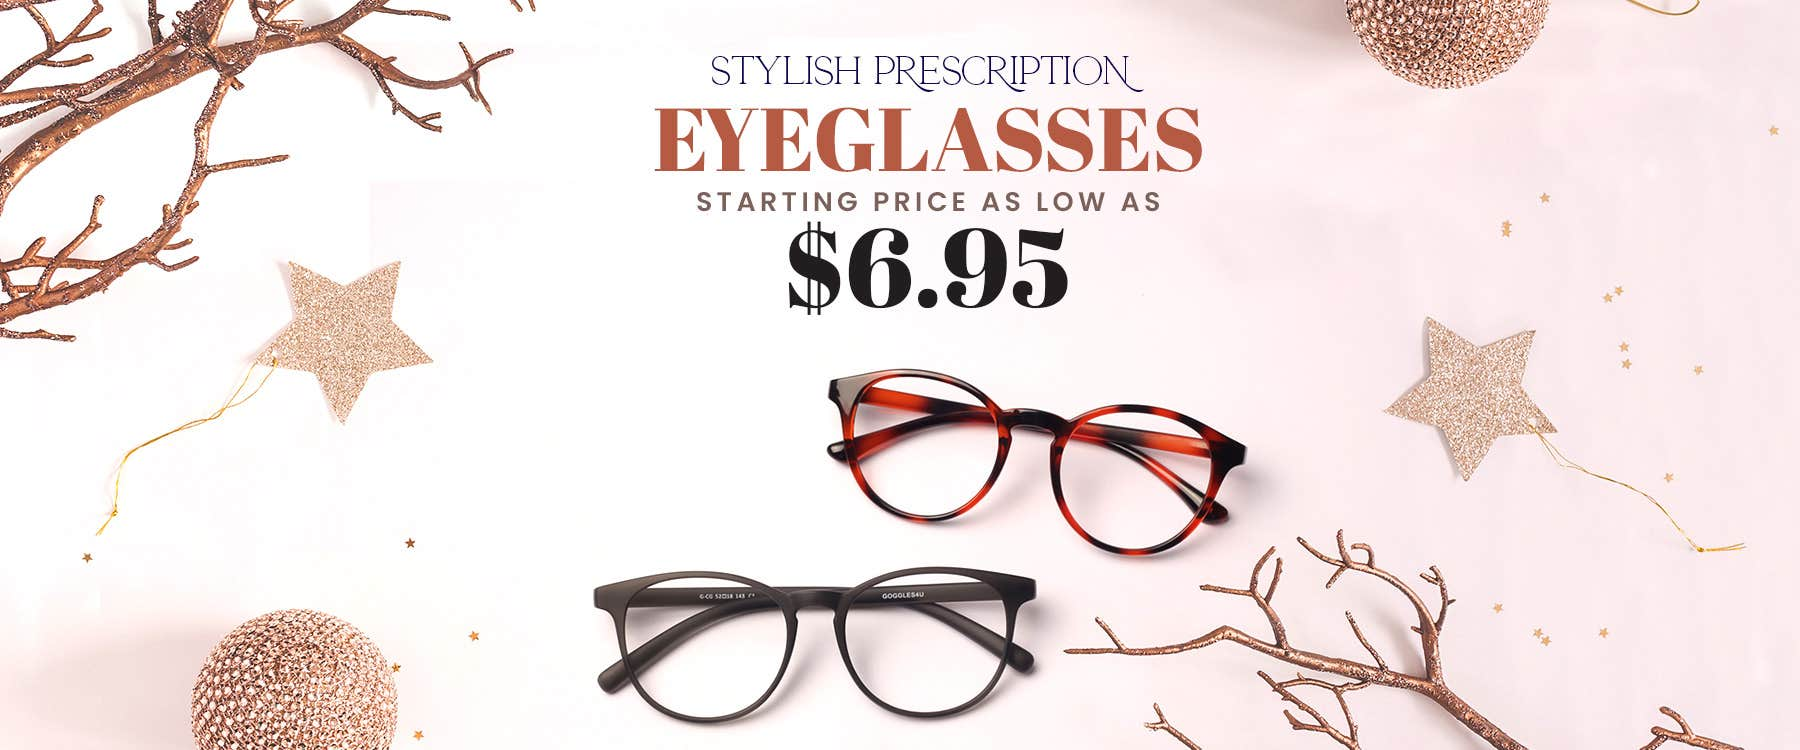 Prescription Eyeglasses Starting From $6.95